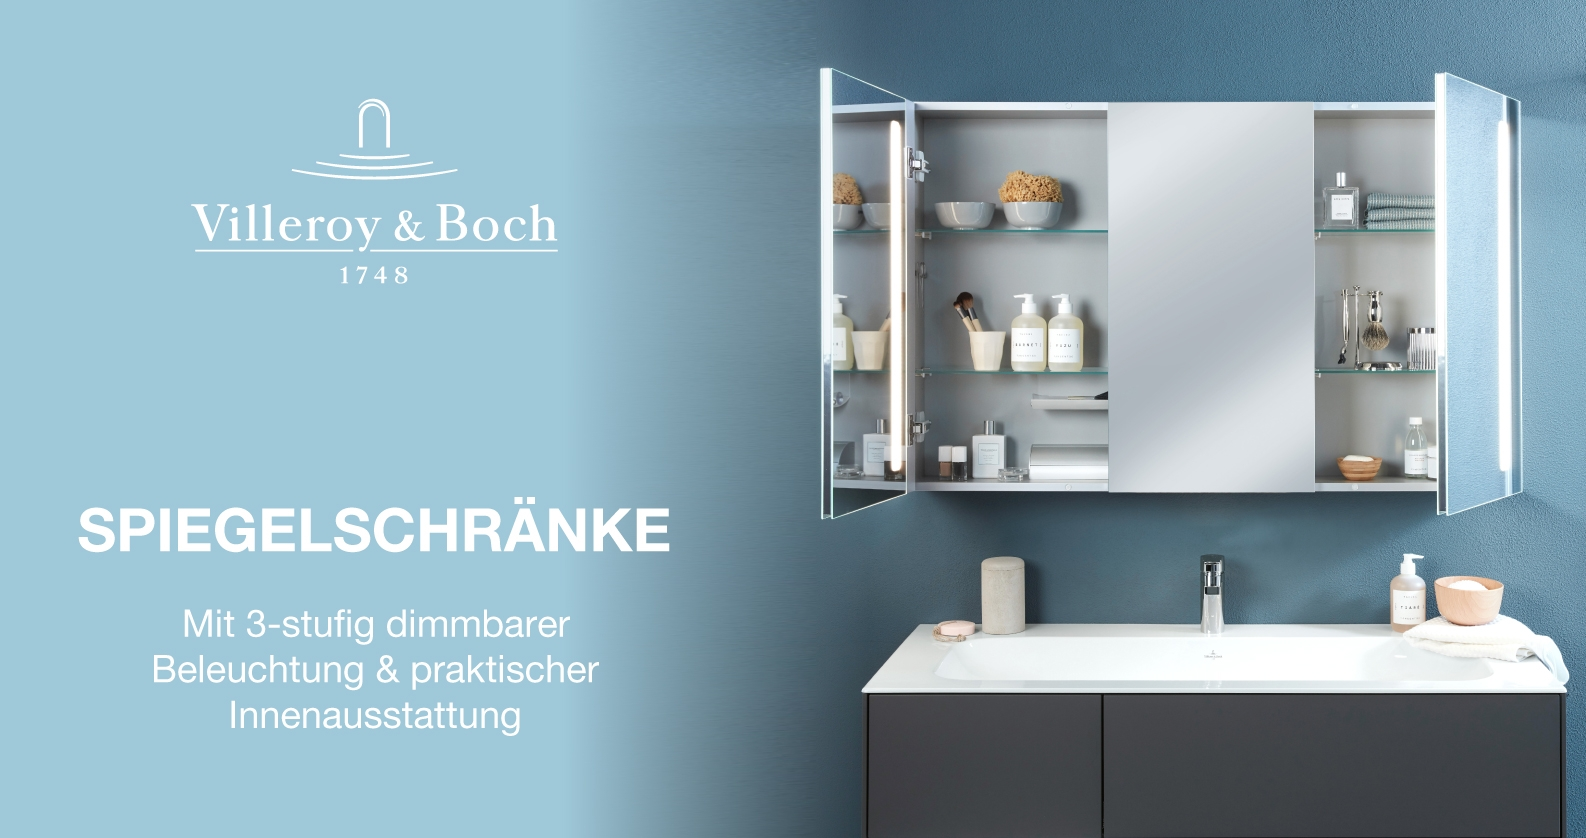 Villeroy & Boch Spiegelschränke